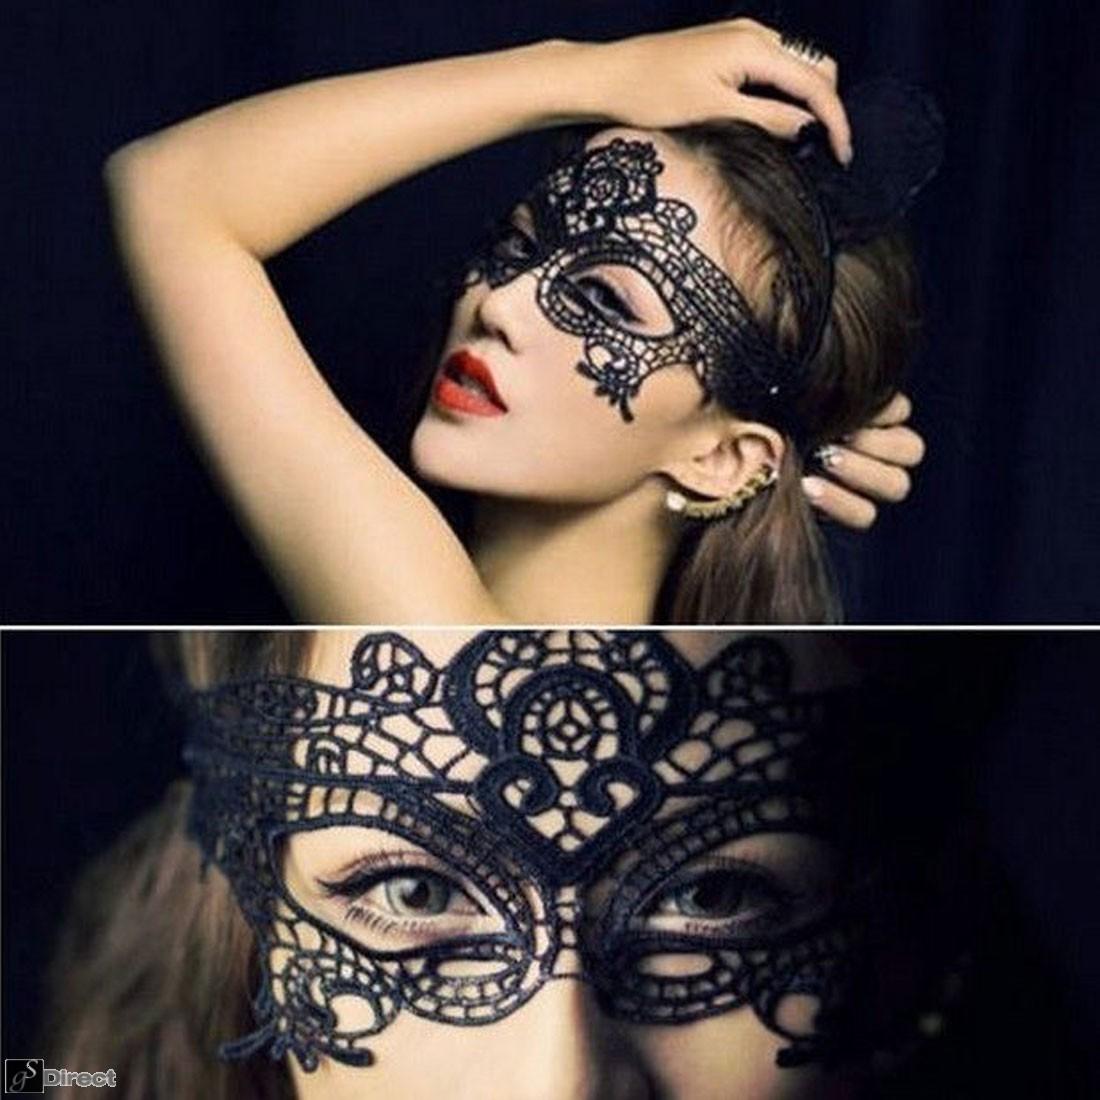 Black Lace Venetian Masquerade Eye Mask